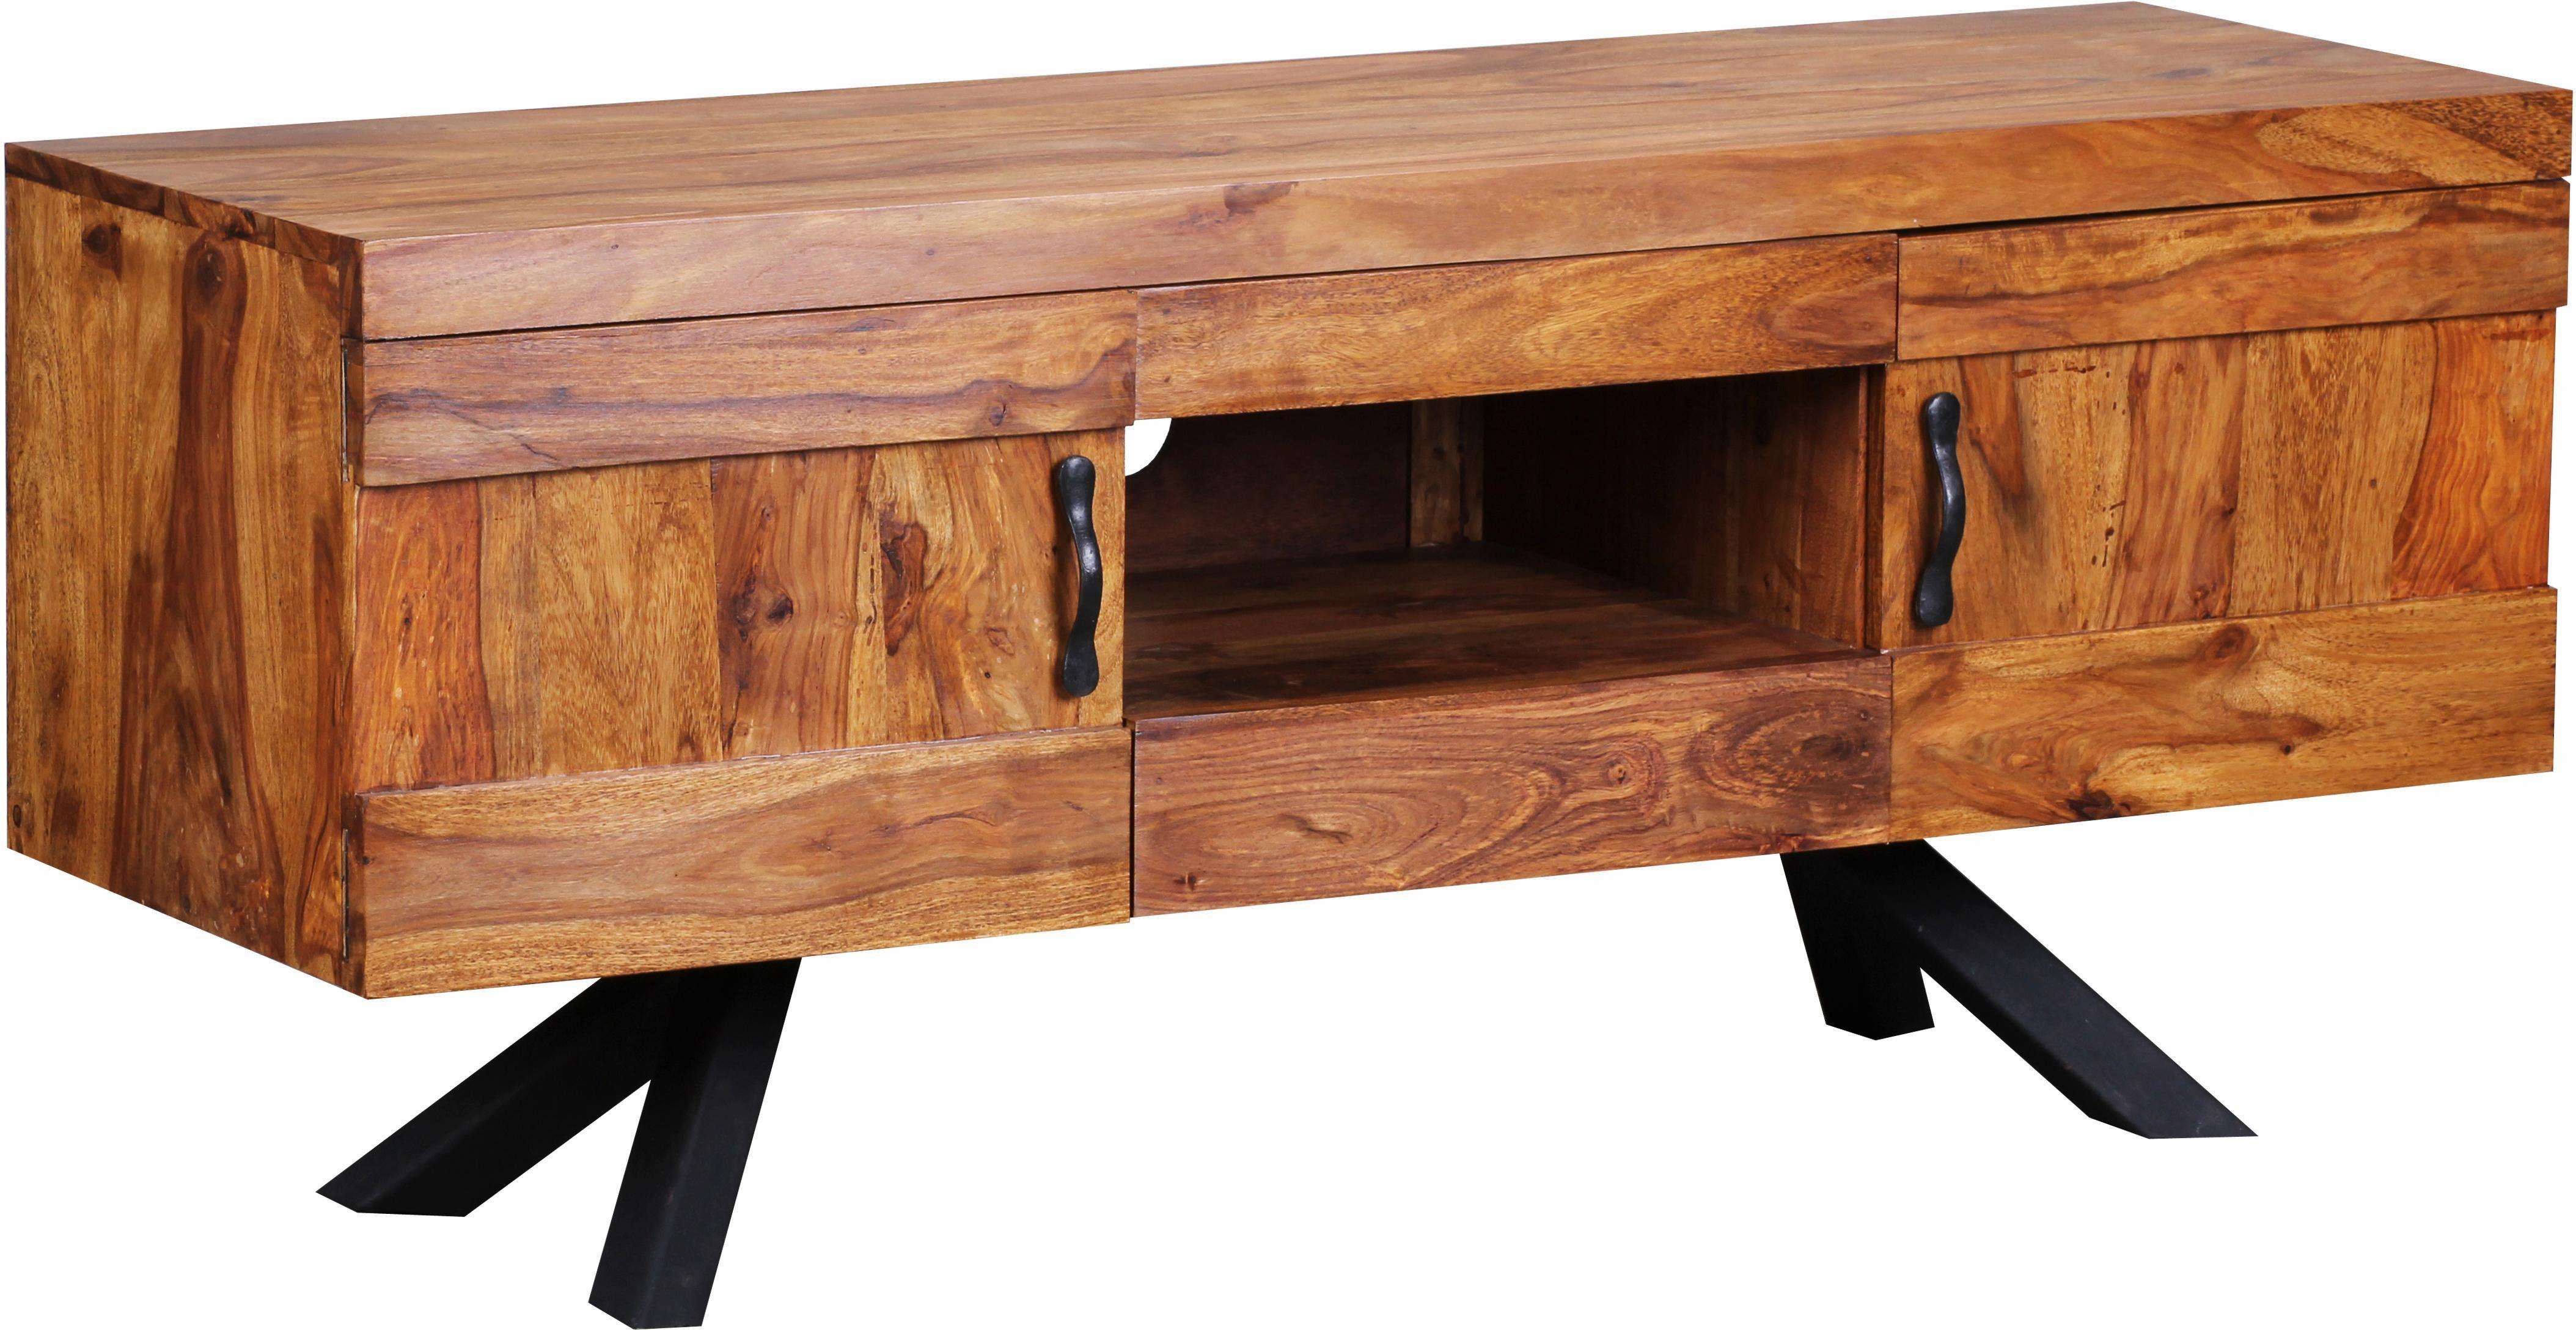 Home affaire Lowboard »Ajanabee«, Breite 135 cm